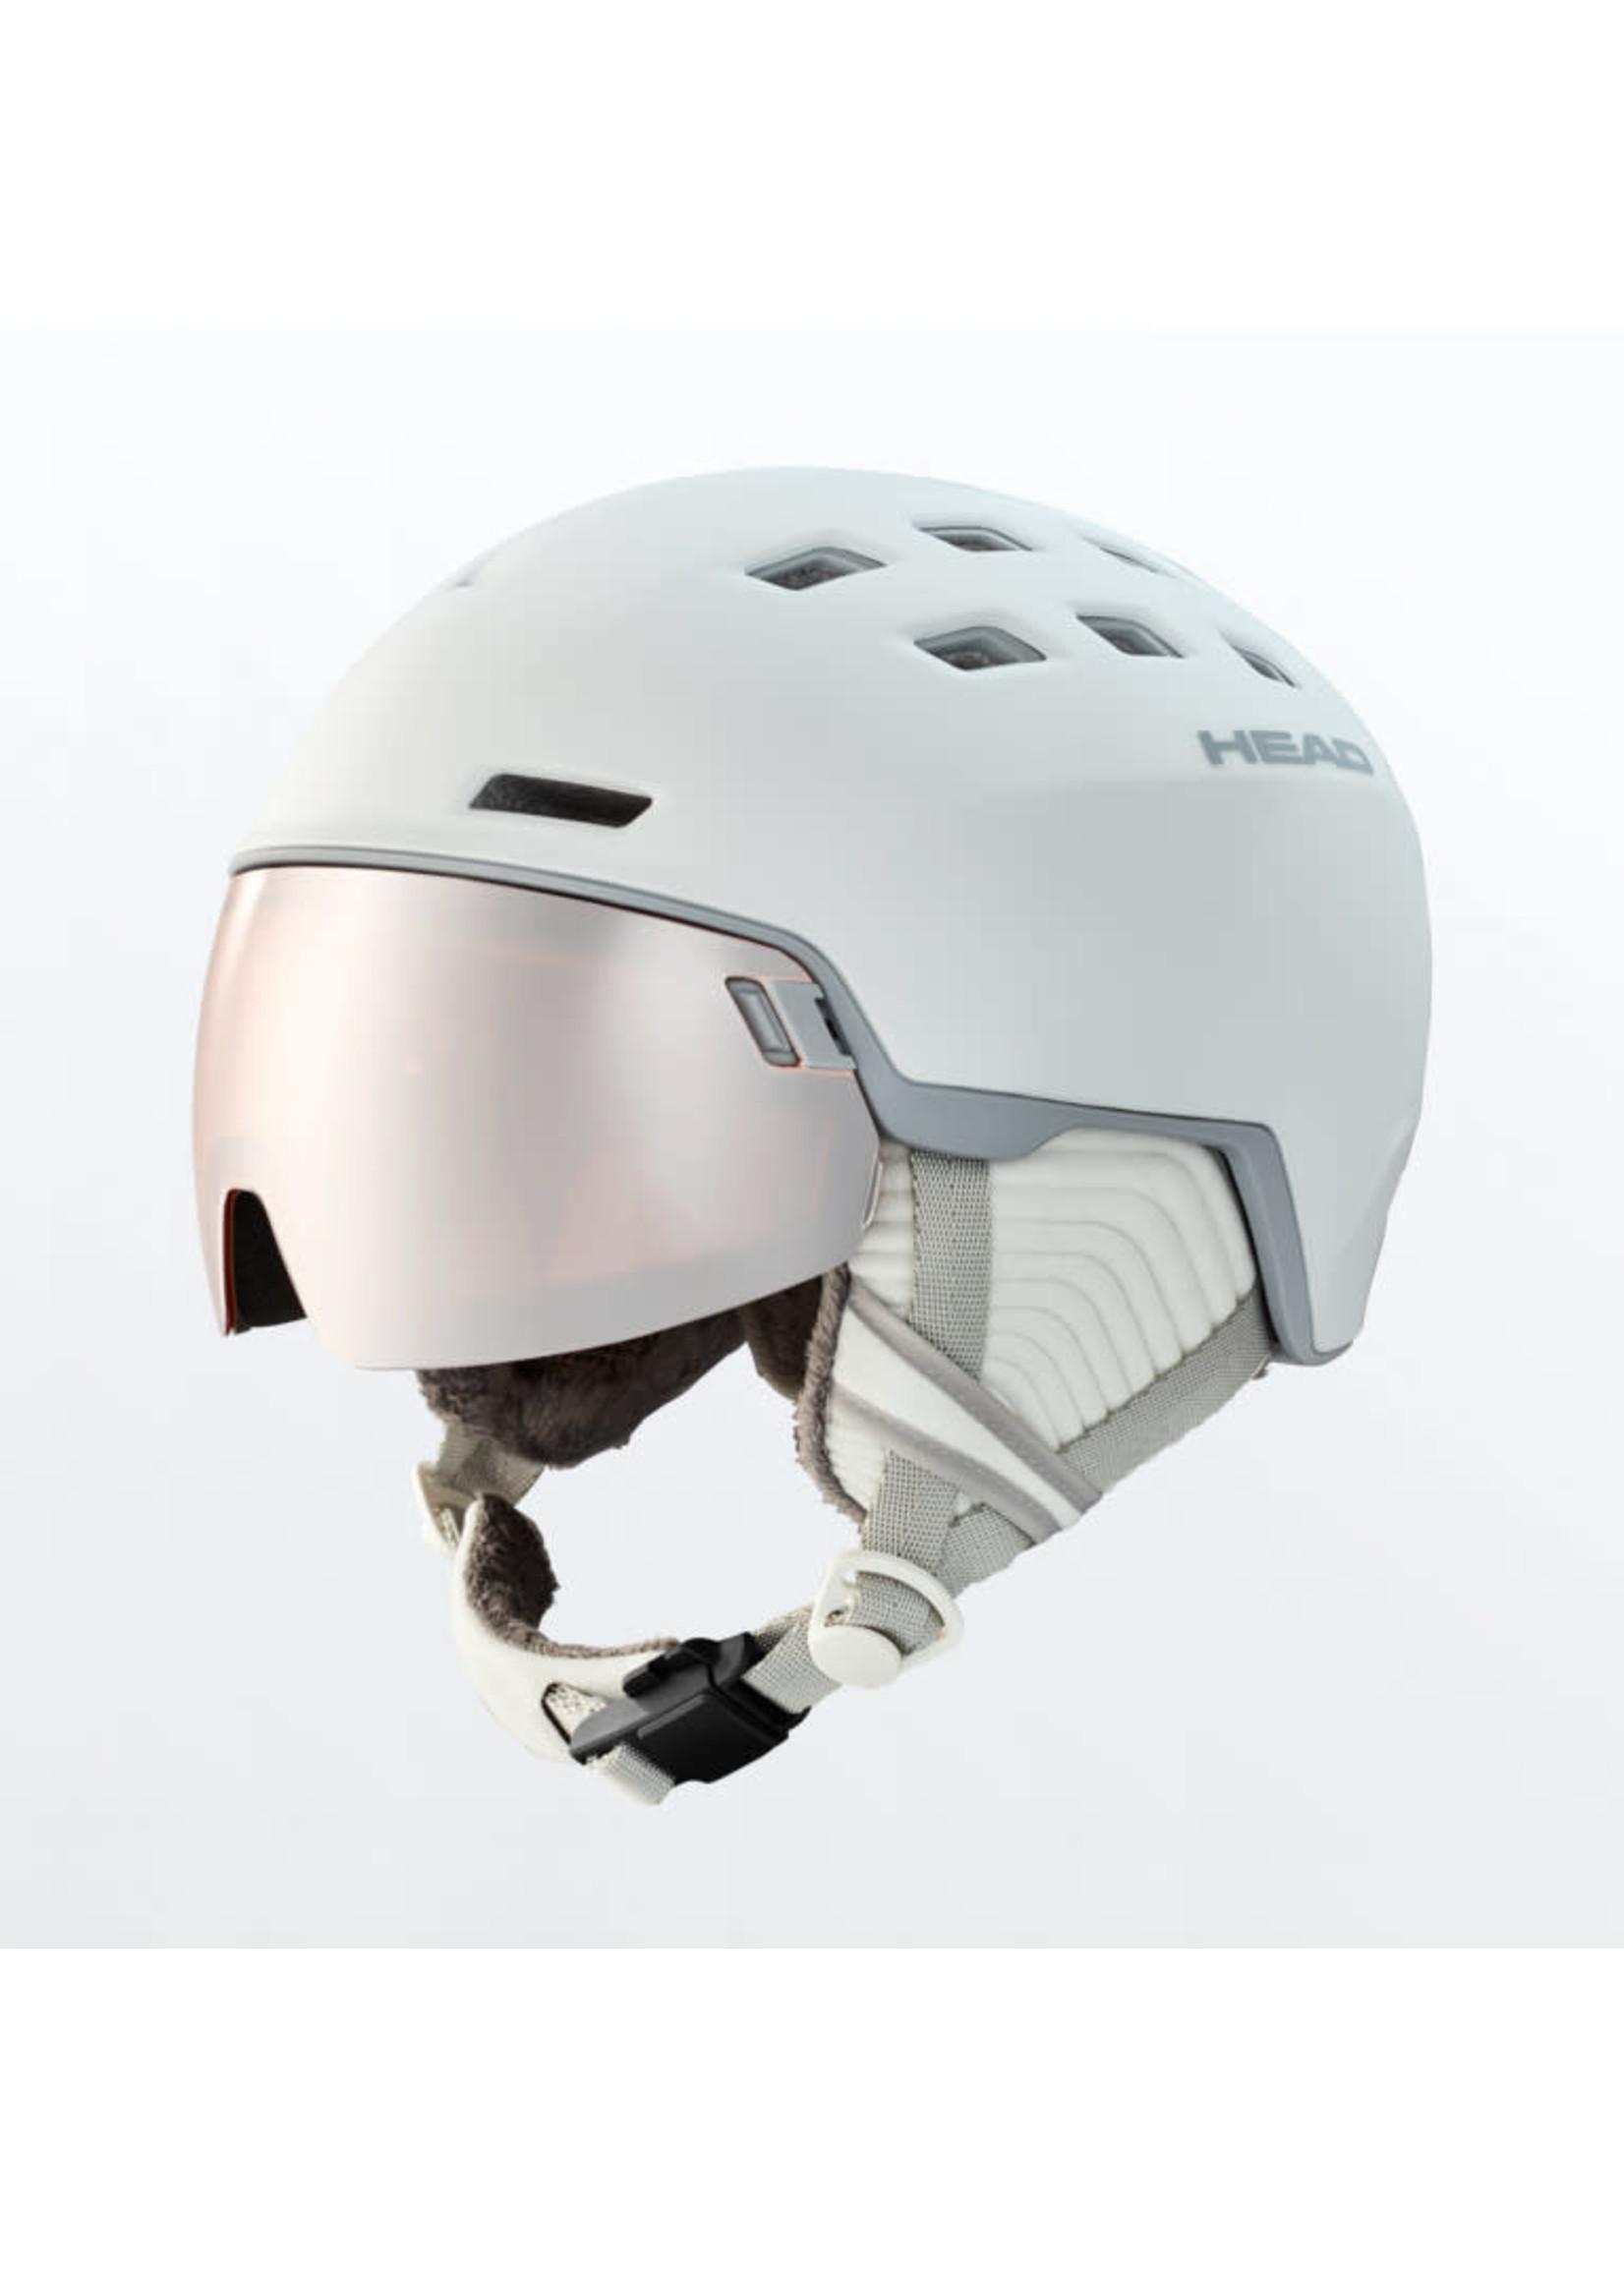 Head Alpine Visor Helmet Rachel w/Spare Lens